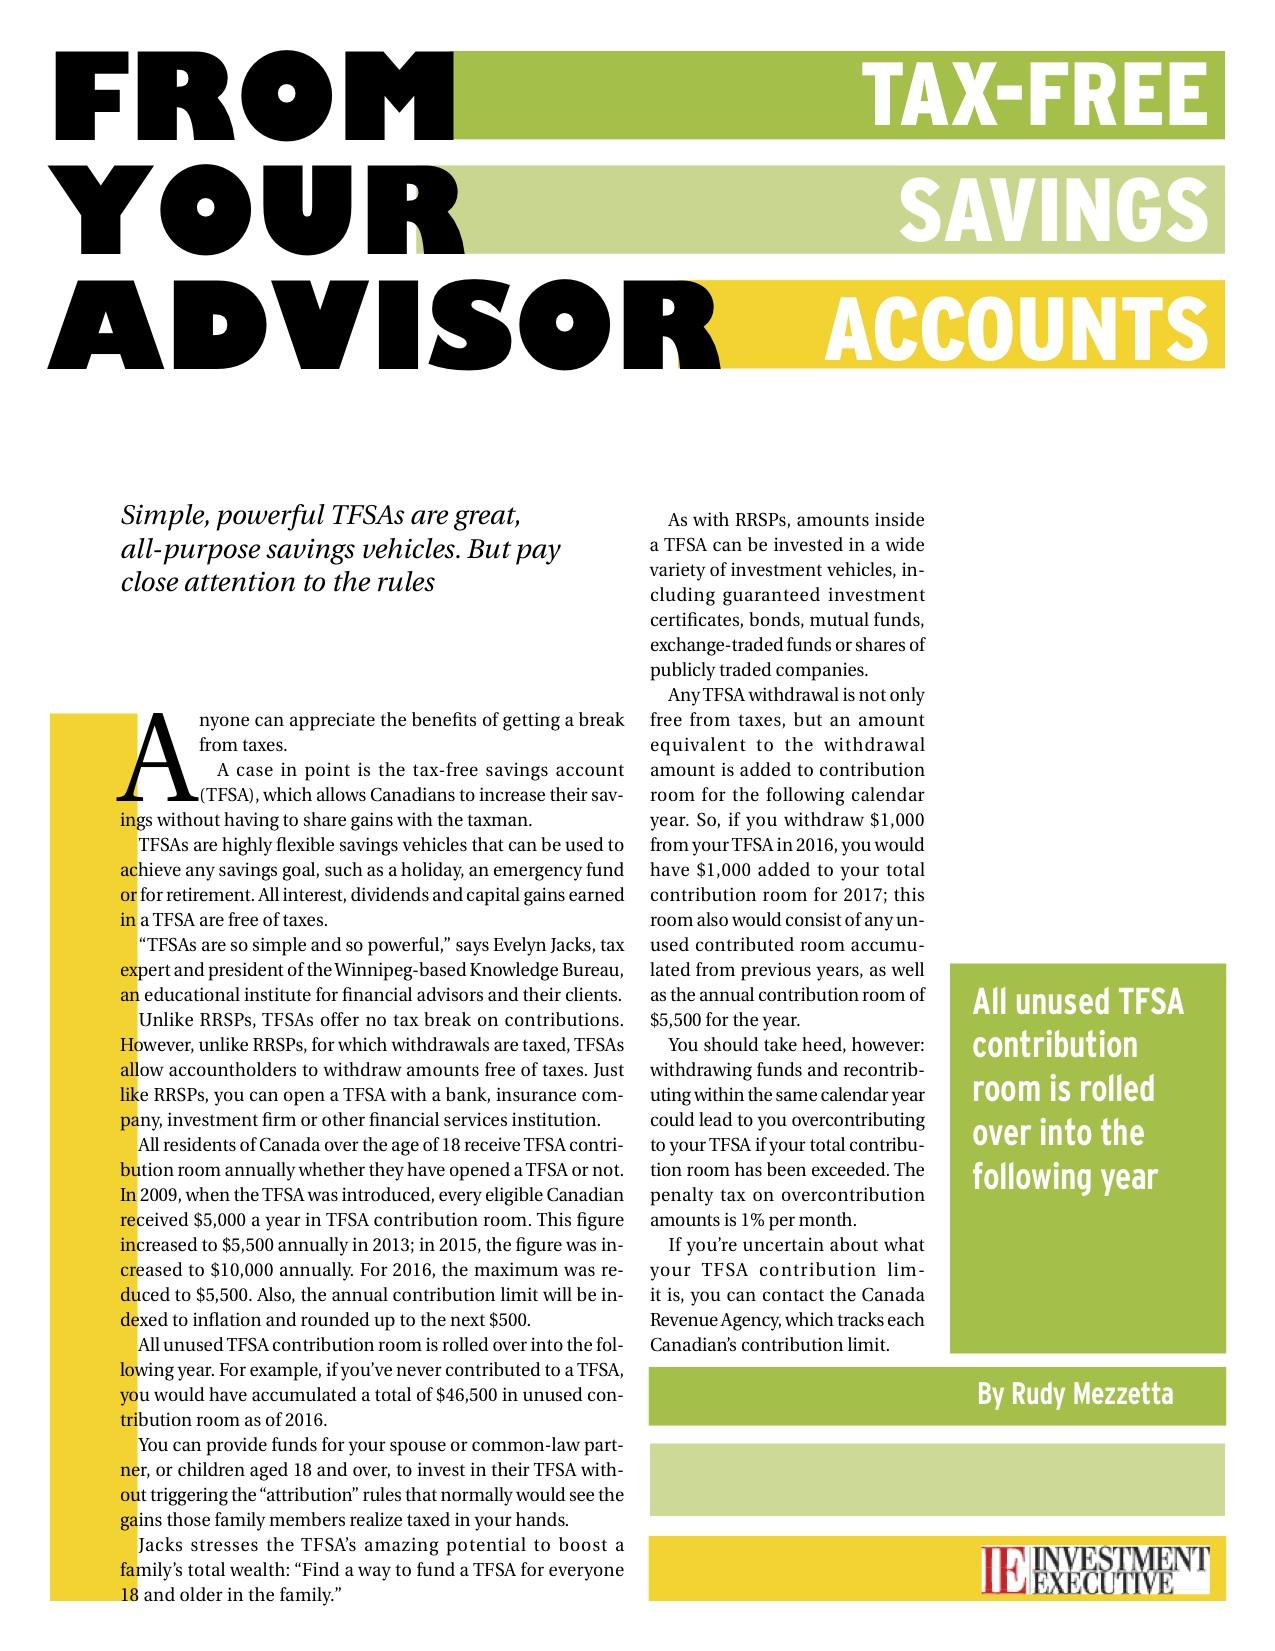 Tax-Free Savings Accounts (TFSAs)